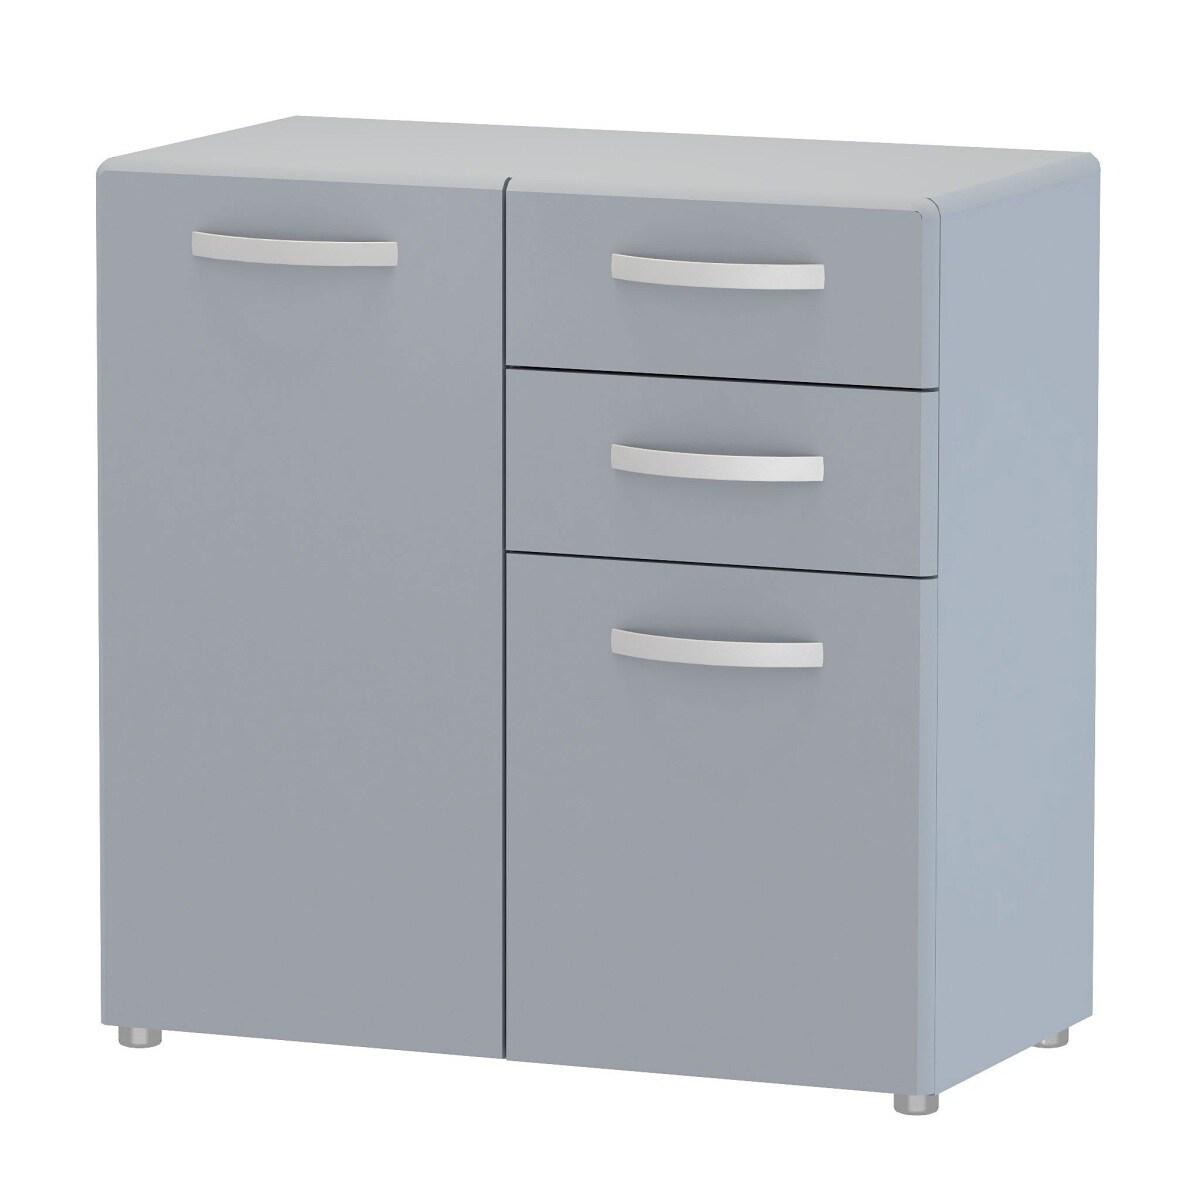 self kommode pia grau nachbildung ca 79 80 41 cm porta. Black Bedroom Furniture Sets. Home Design Ideas